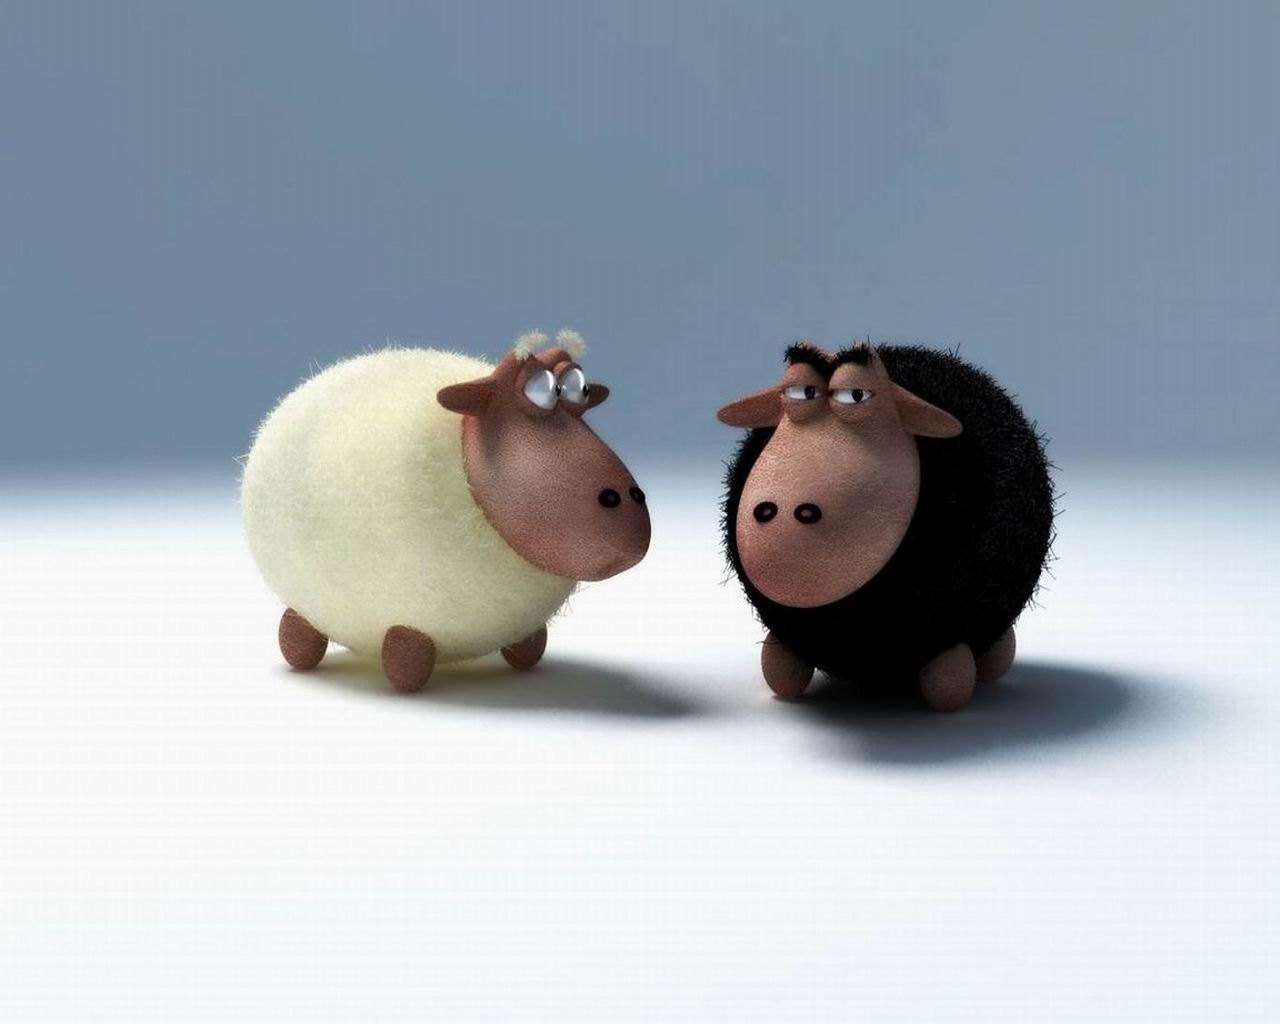 http://4.bp.blogspot.com/_Qxy2_aOu1eQ/THb-8xOBPFI/AAAAAAAABgI/AFI5elXY7dA/s1600/3d_animals_6.jpg